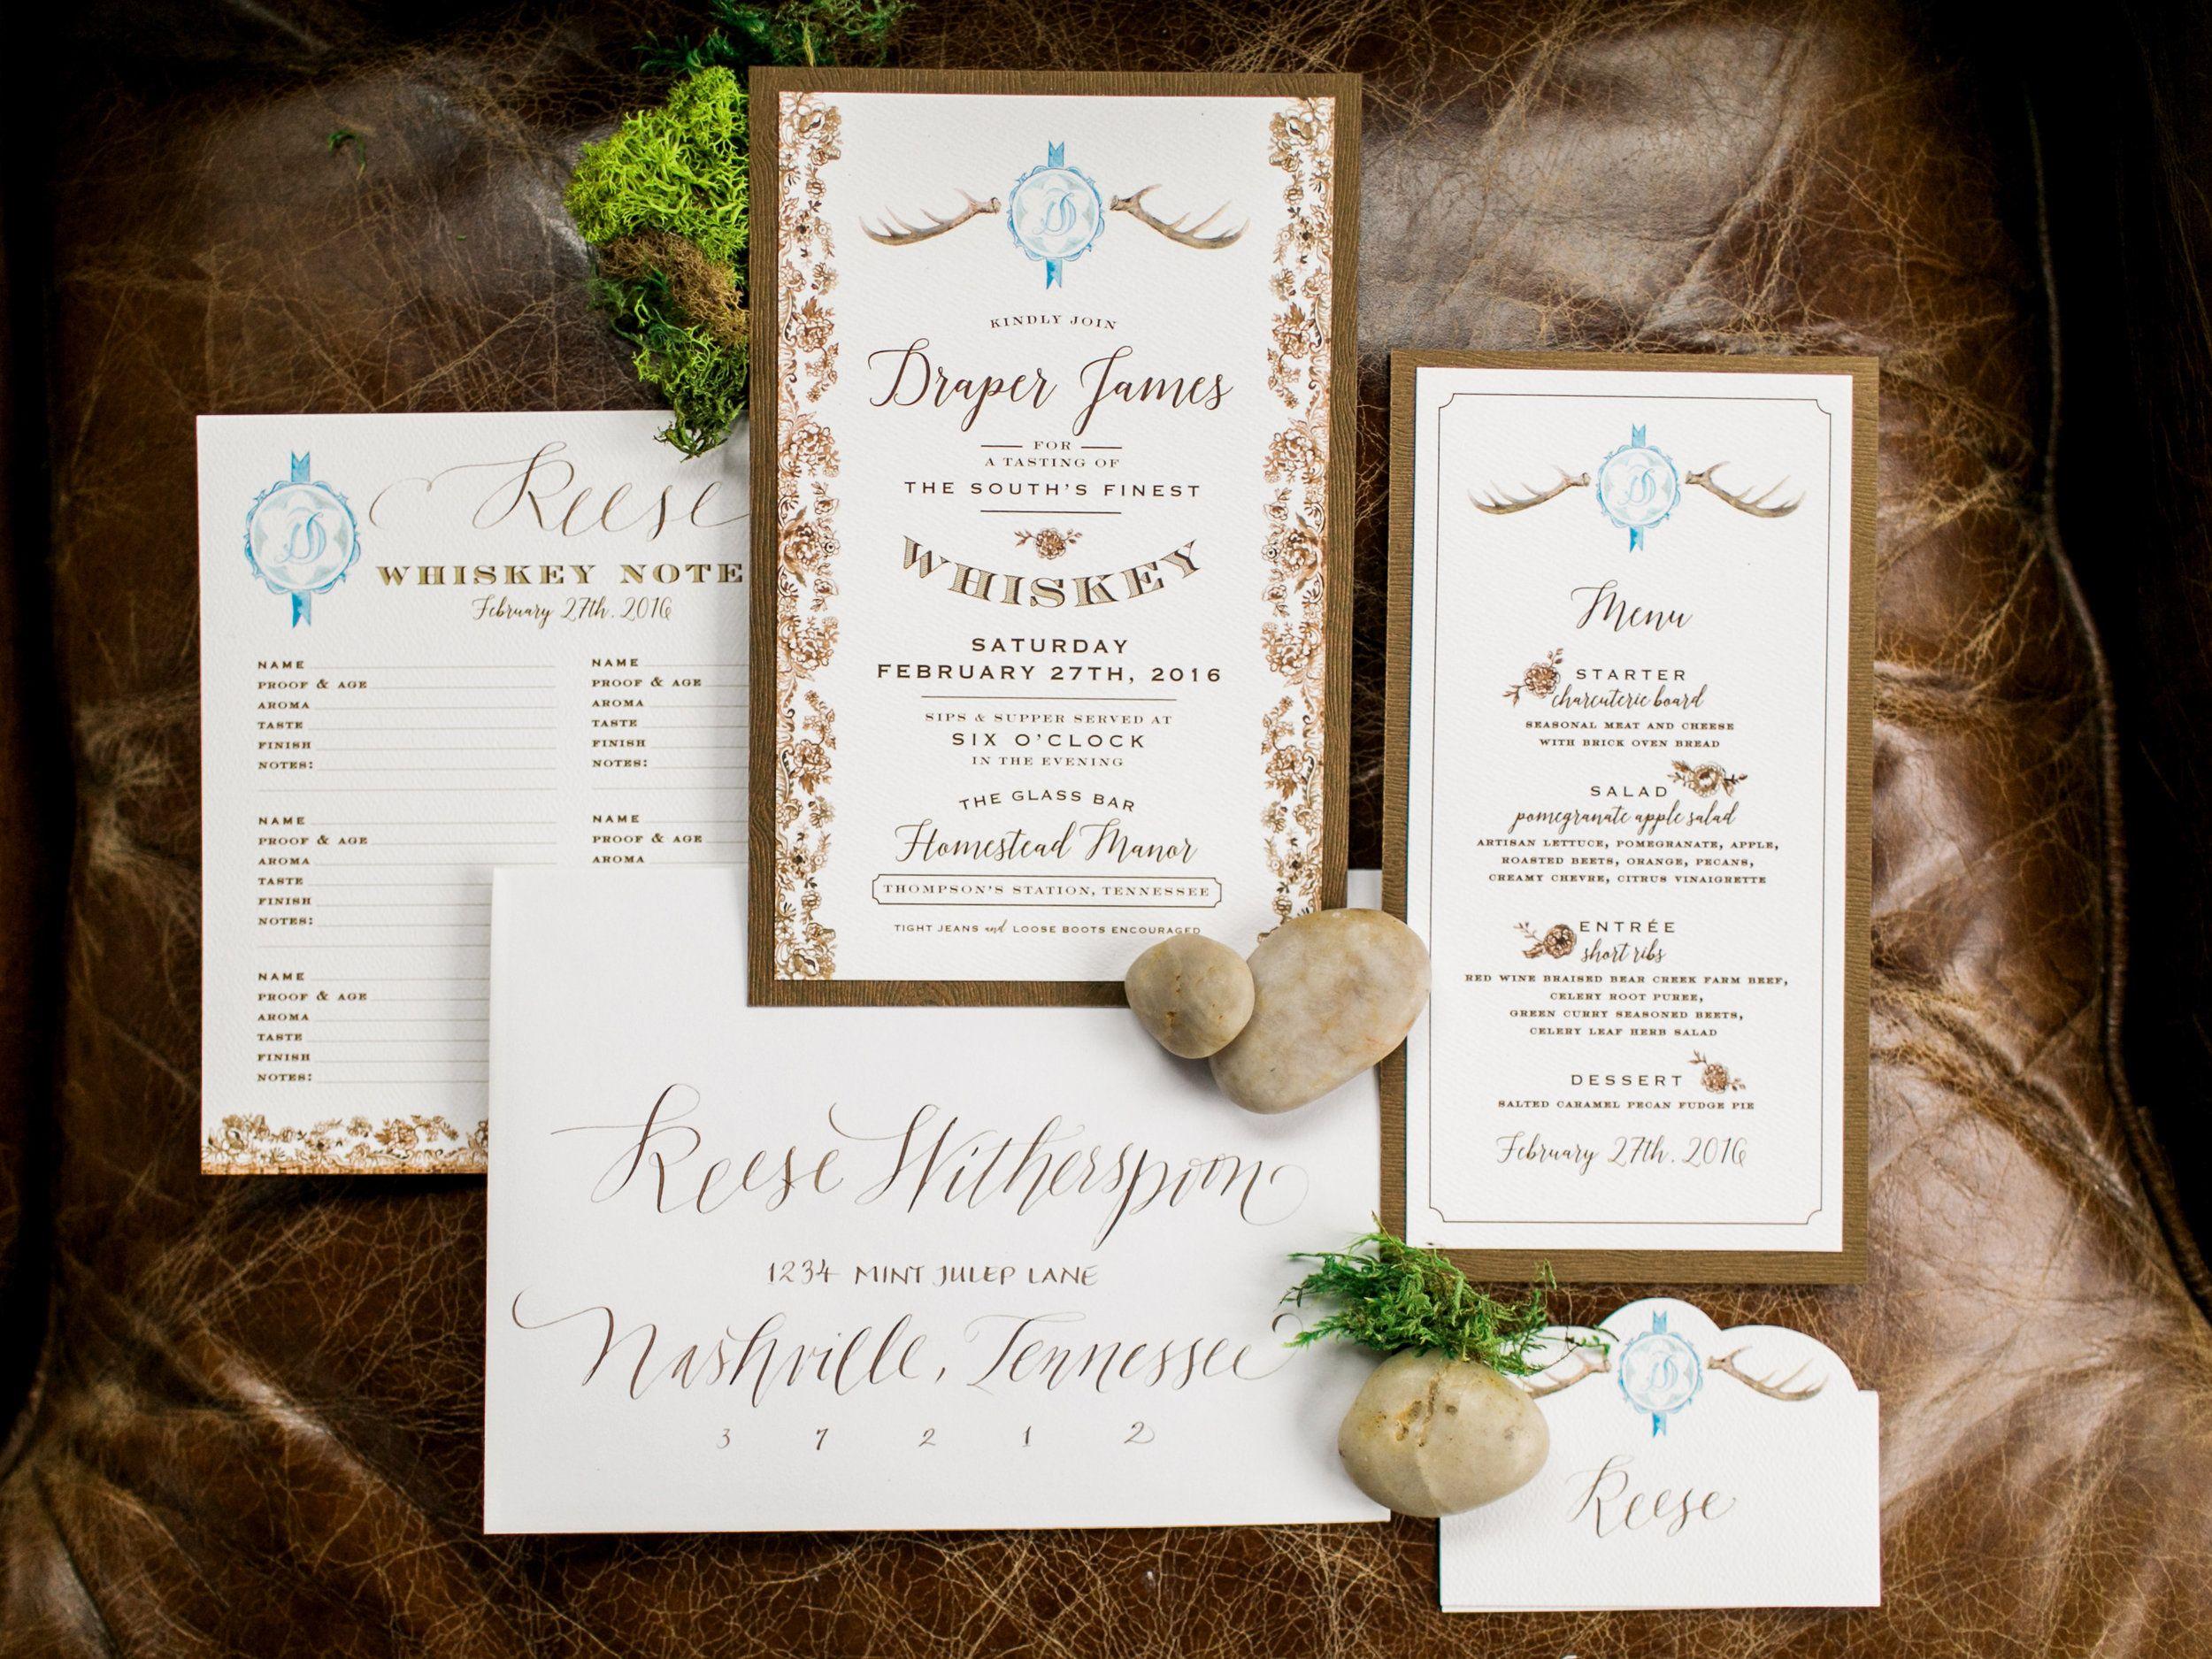 Draper James party invitation / style photoshoot / antlers / whiskey ...